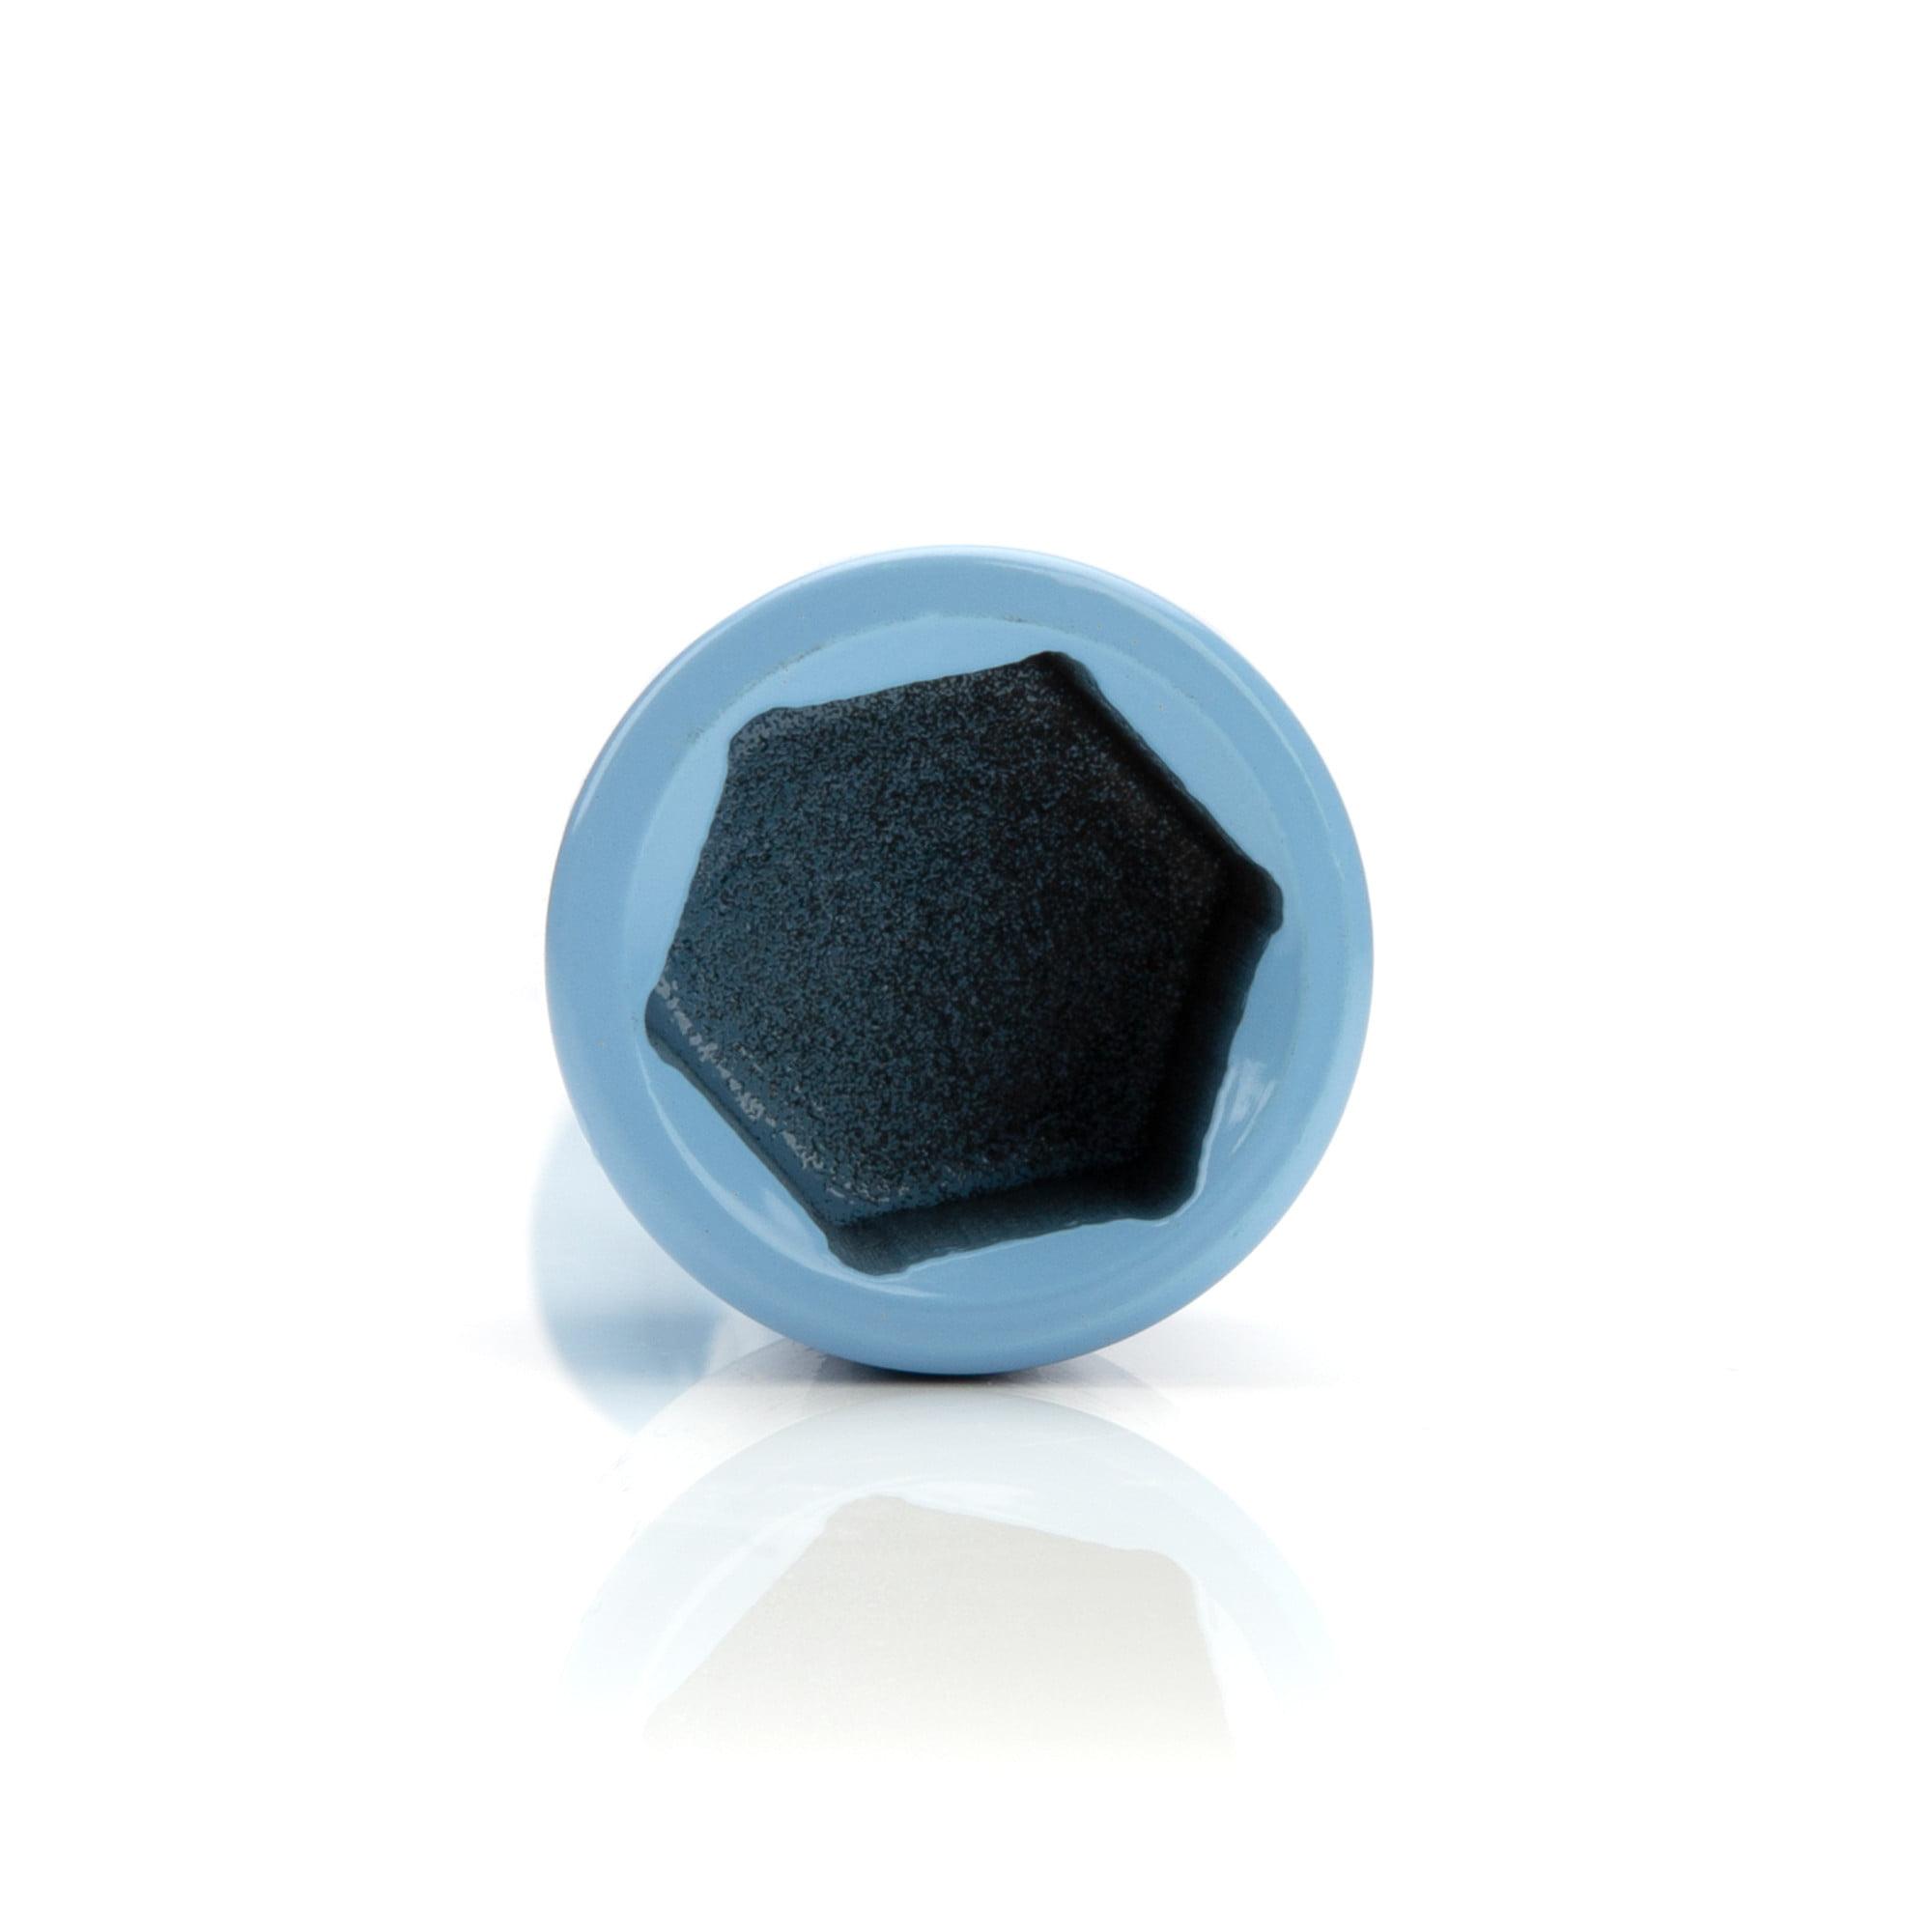 Sky Blue STEELMAN 50074 1//2-Inch Drive x 21mm 100 ft-lb Torque Stick